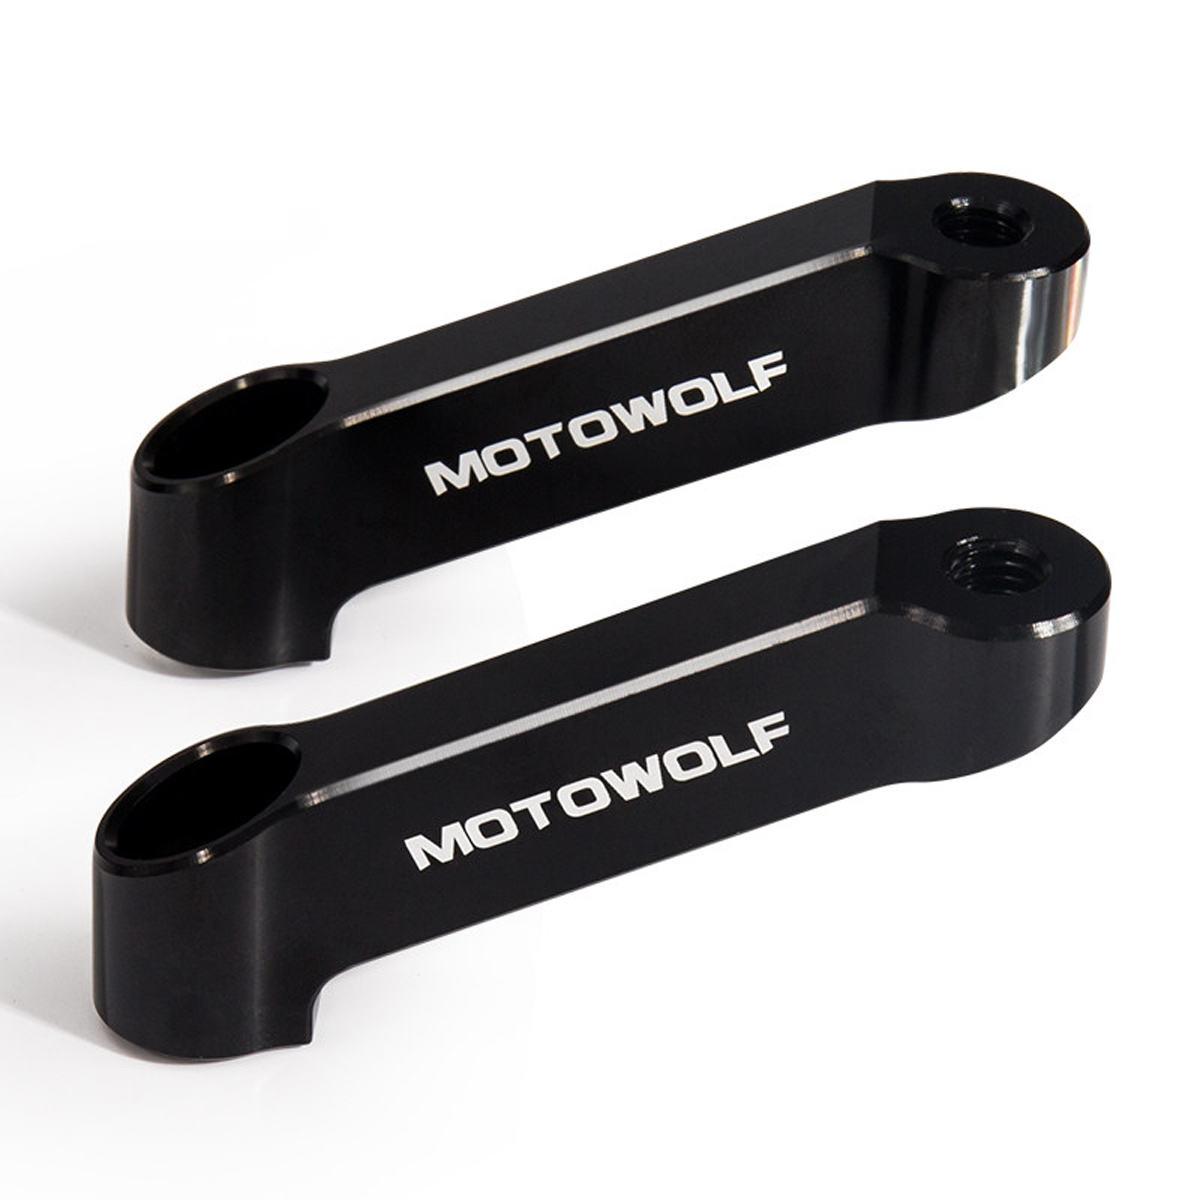 Motorcycle-Rearview-Mirror-Extension-Mount-Bracket-Holder-Universal-8-10mm-Motorbike-Rear-view-Mirror-Extension-Bracket-20